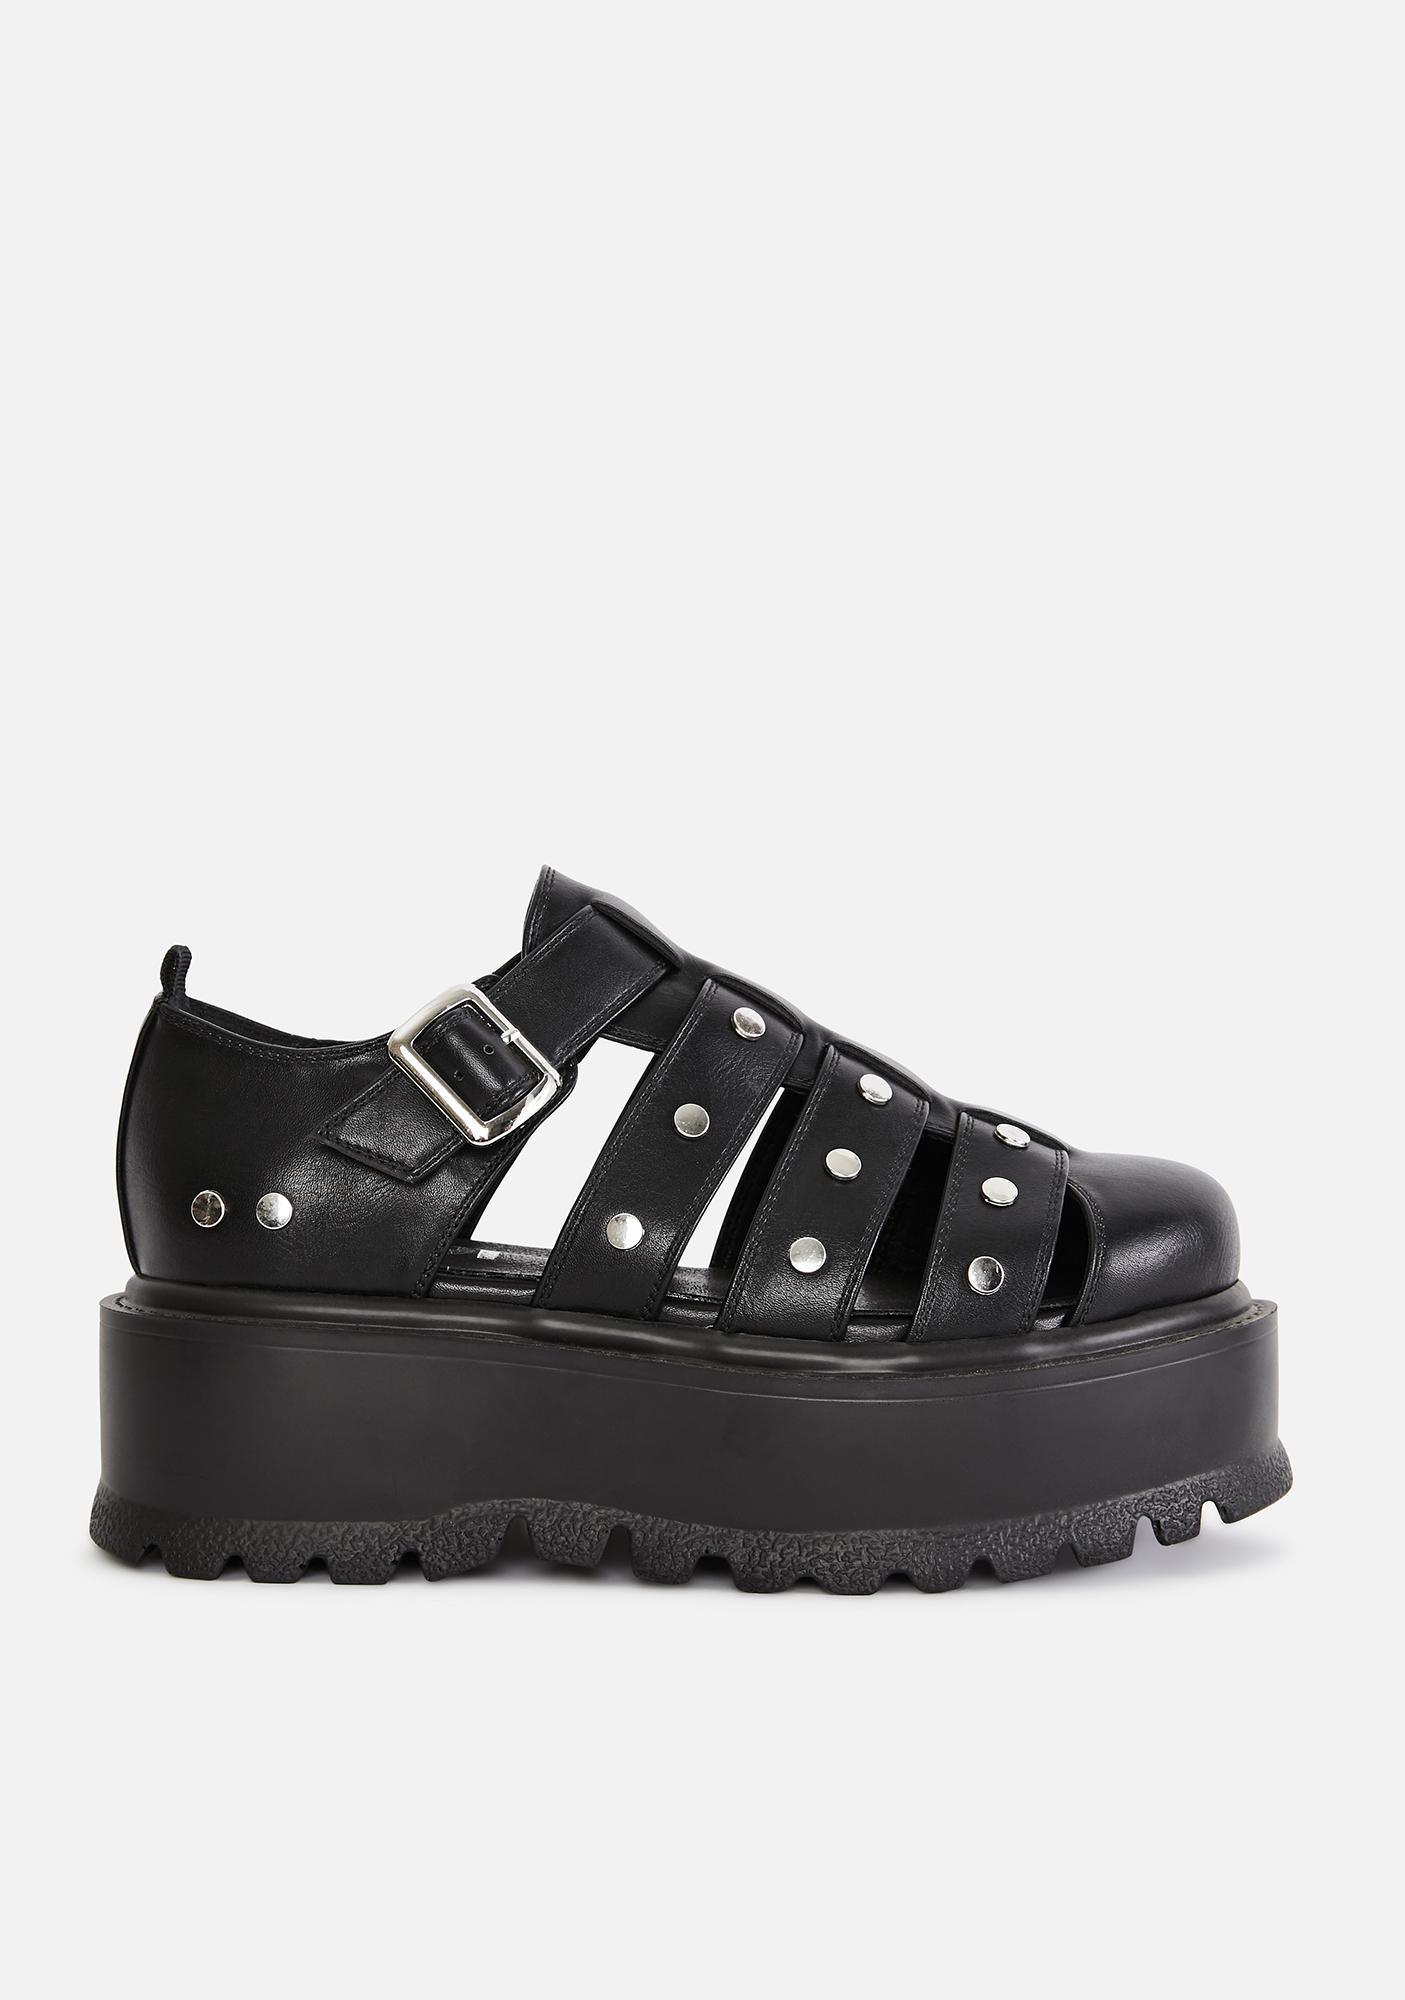 Koi Footwear Black Relay Platform Sandals